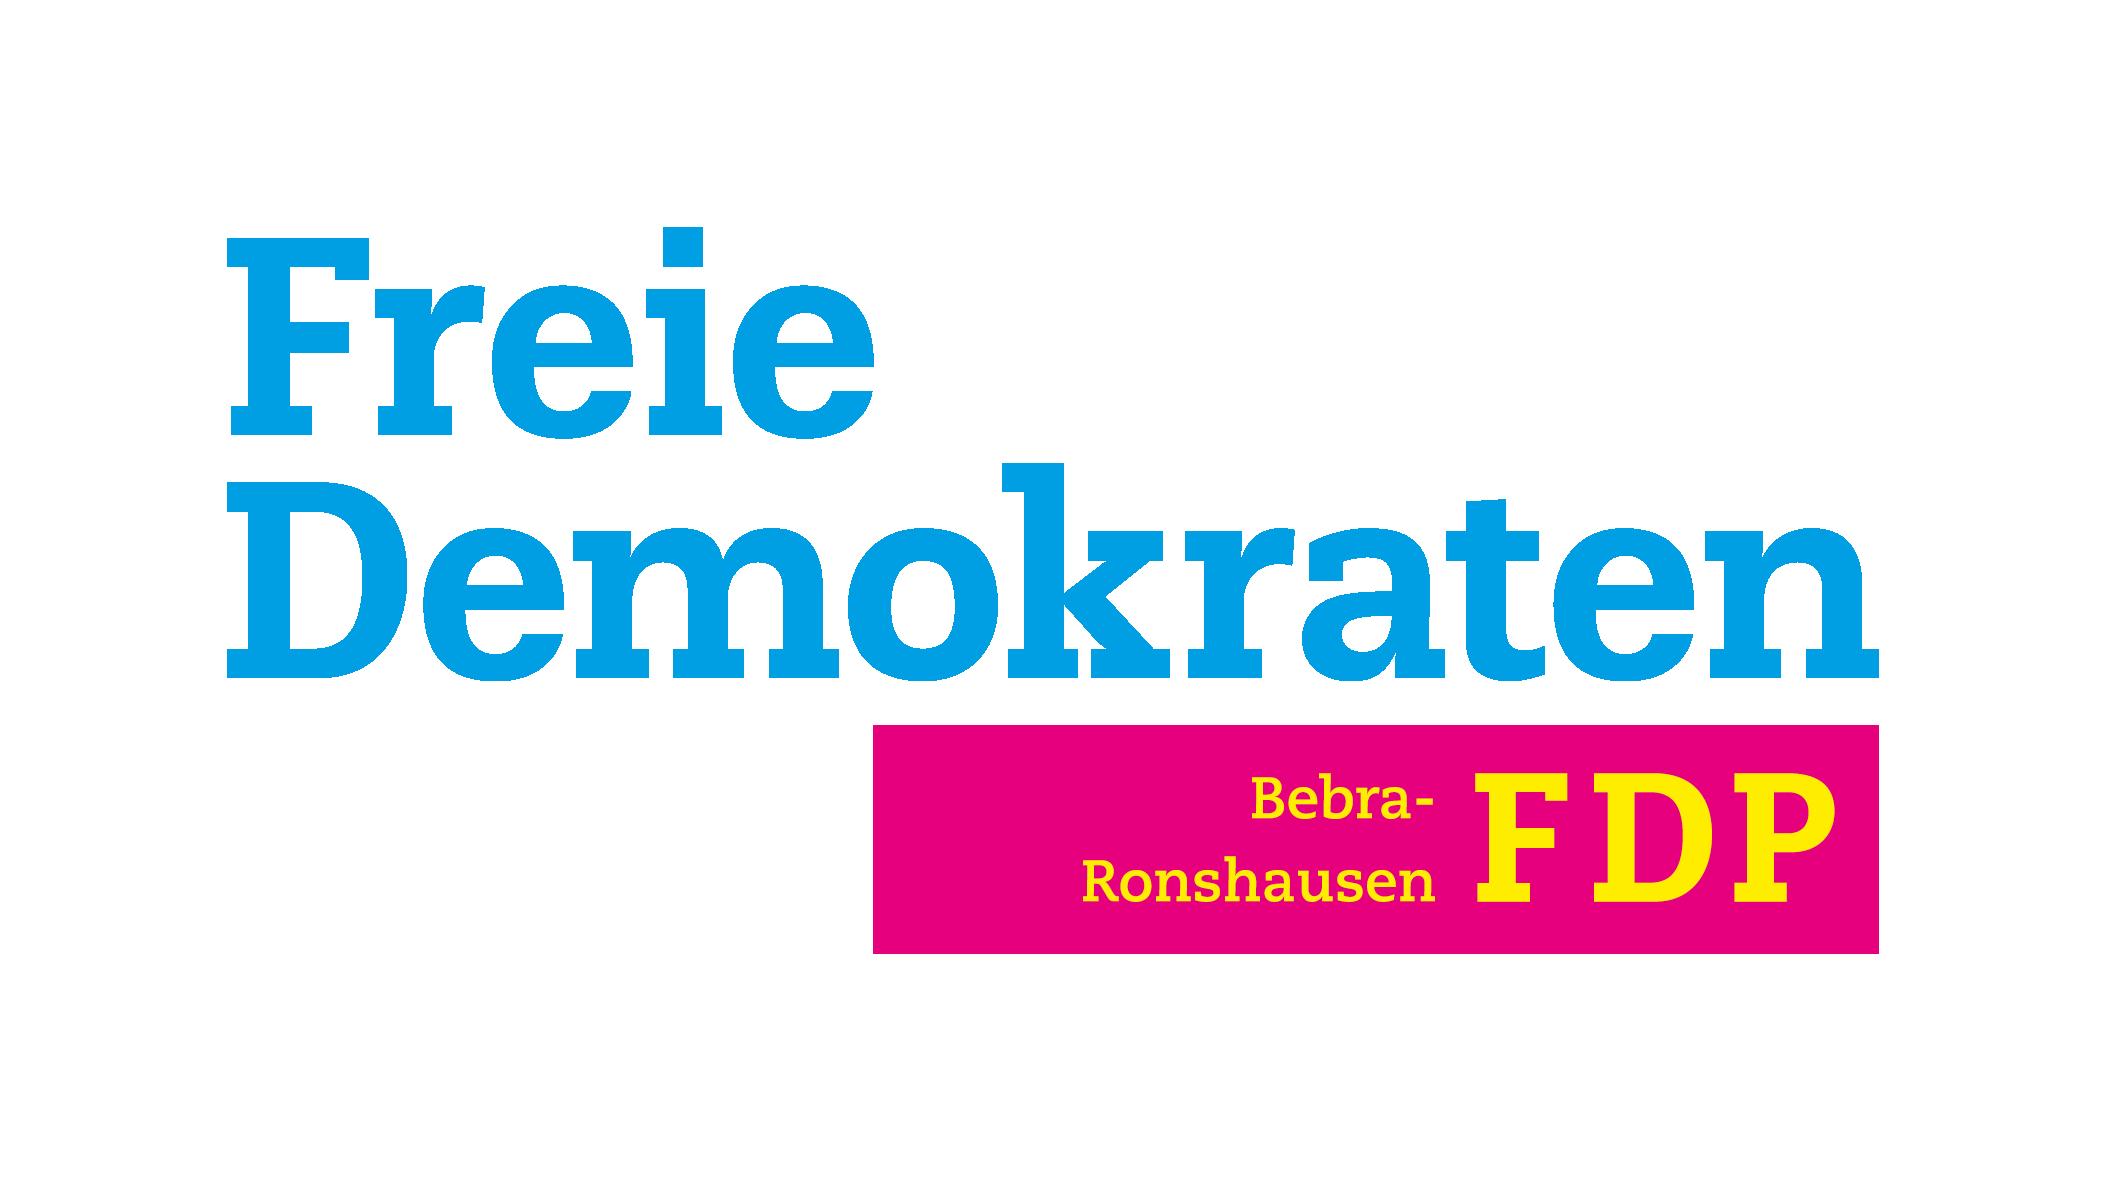 Bebra-Ronshausen